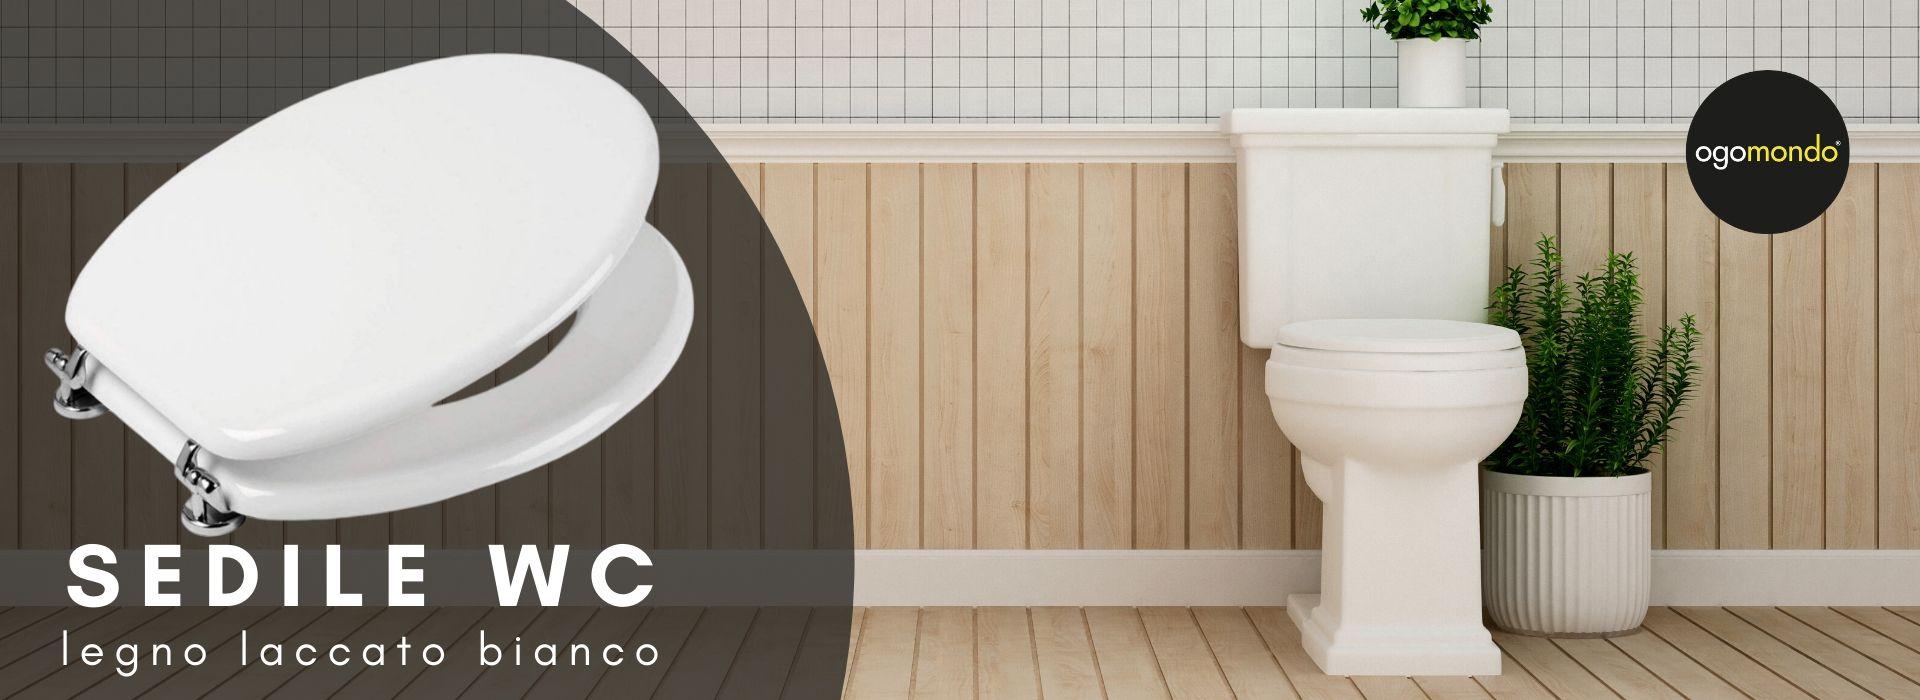 Sedile WC in legno bianco